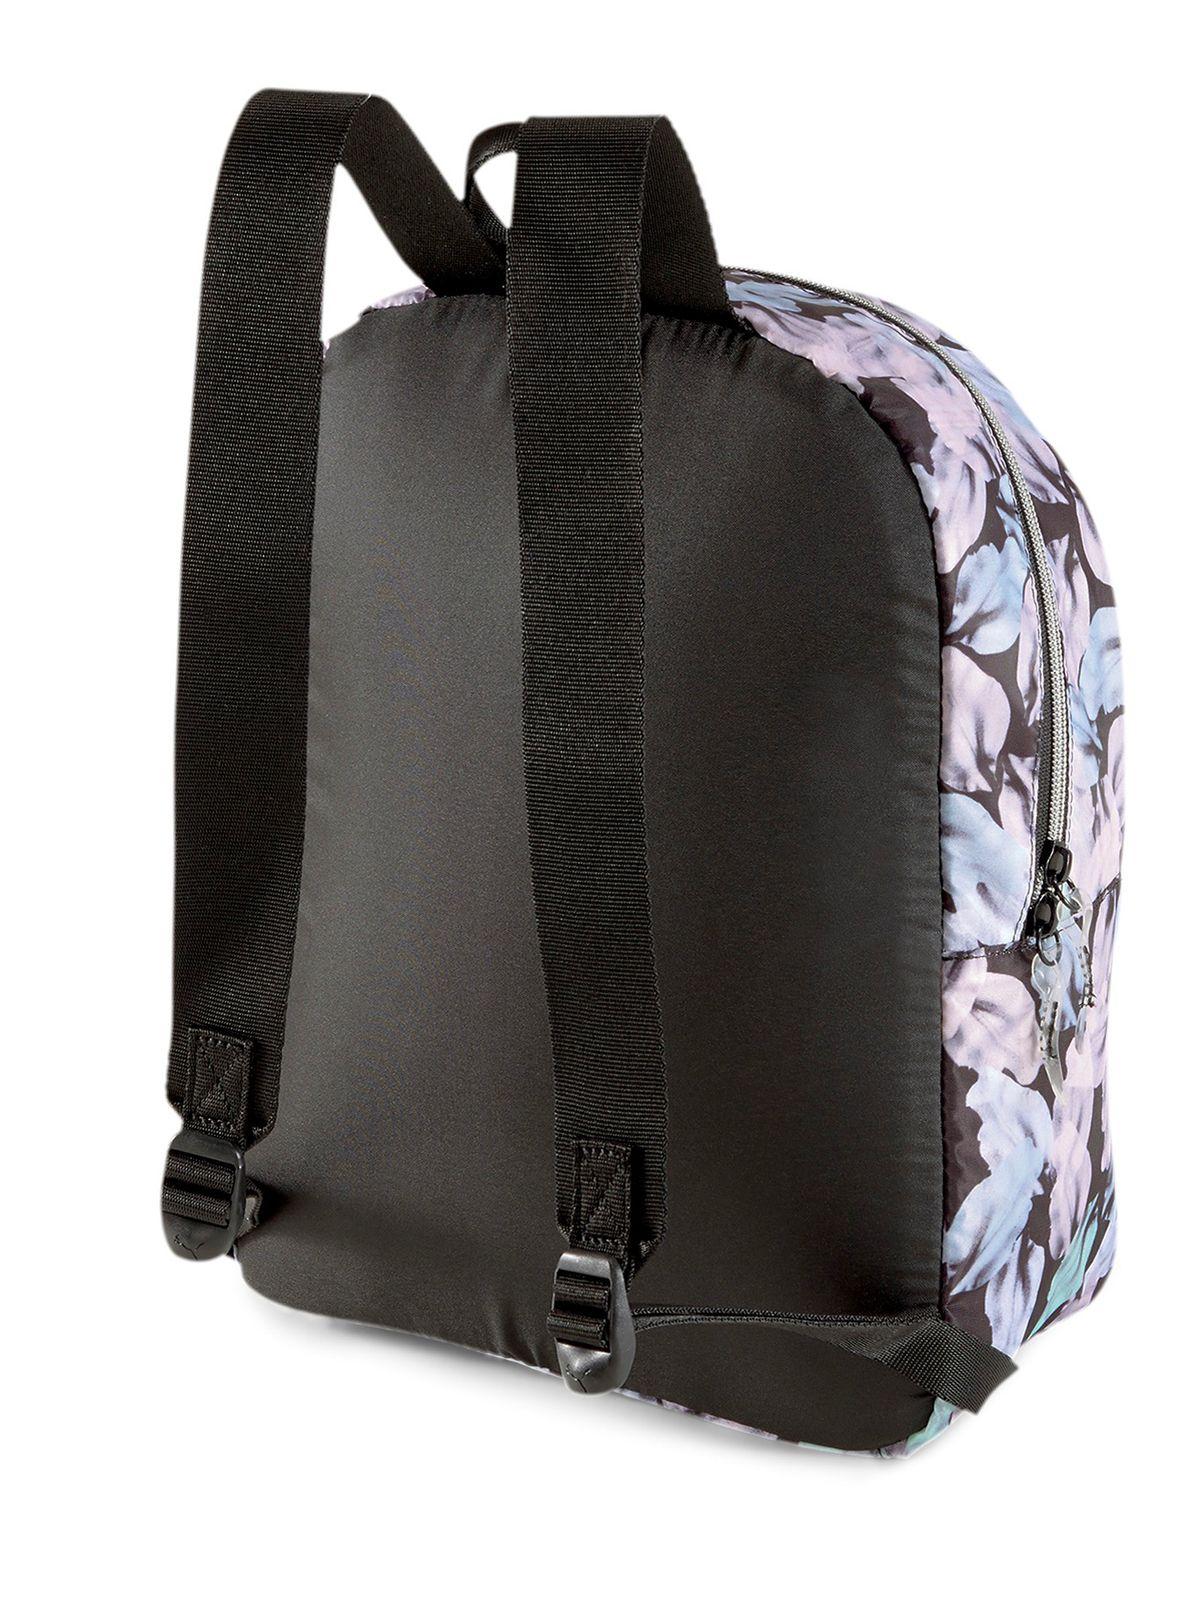 PUMA WMN Core Seasonal Backpack Puma Black Leaf Aop